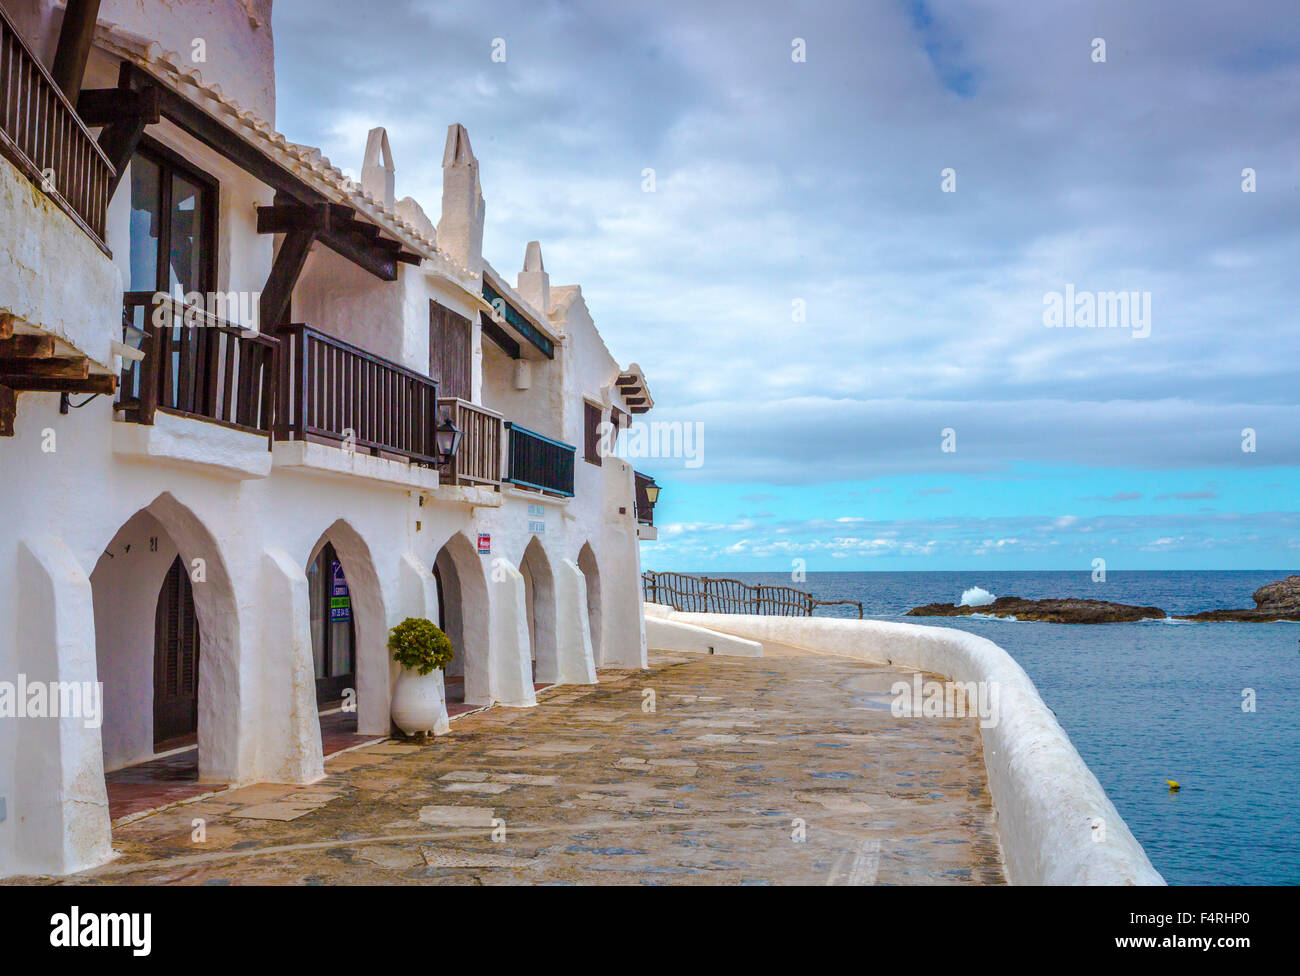 Balearic Islands, Binibeca, Fishing Village, Menorca, Island, Old Binibeca, Spain, Europe, Spring, arch, architecture, - Stock Image